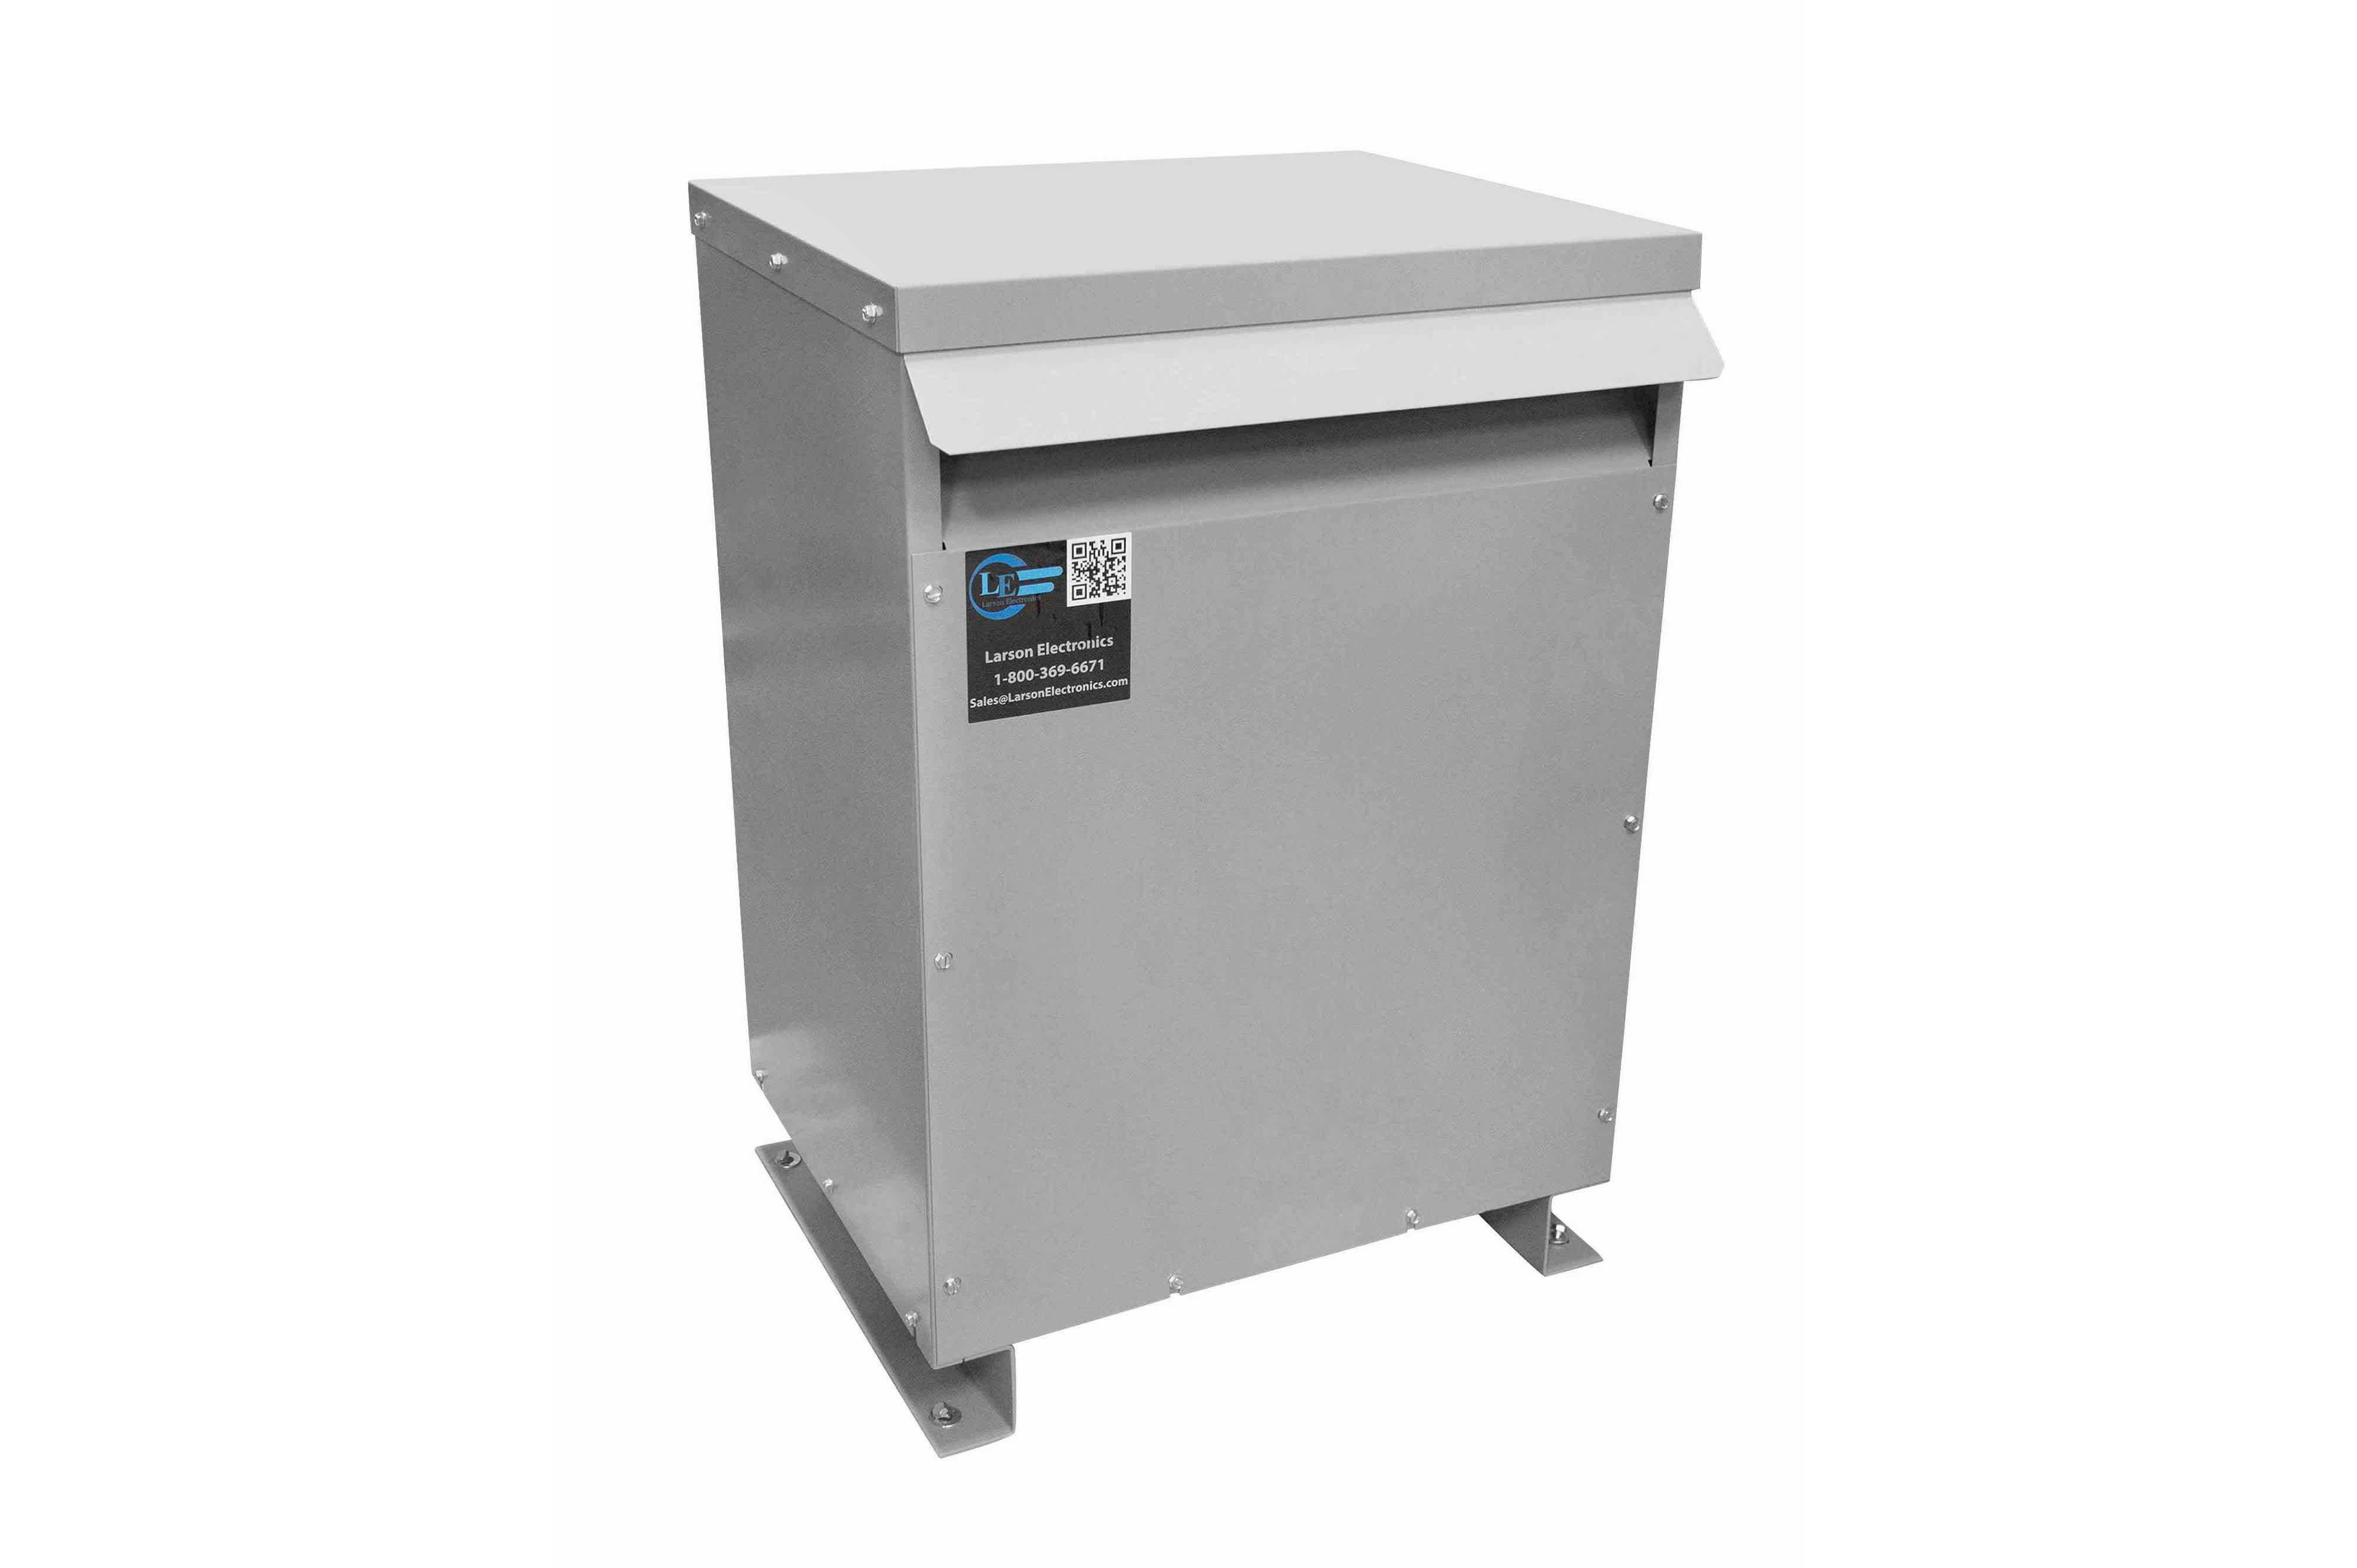 175 kVA 3PH Isolation Transformer, 240V Wye Primary, 208V Delta Secondary, N3R, Ventilated, 60 Hz